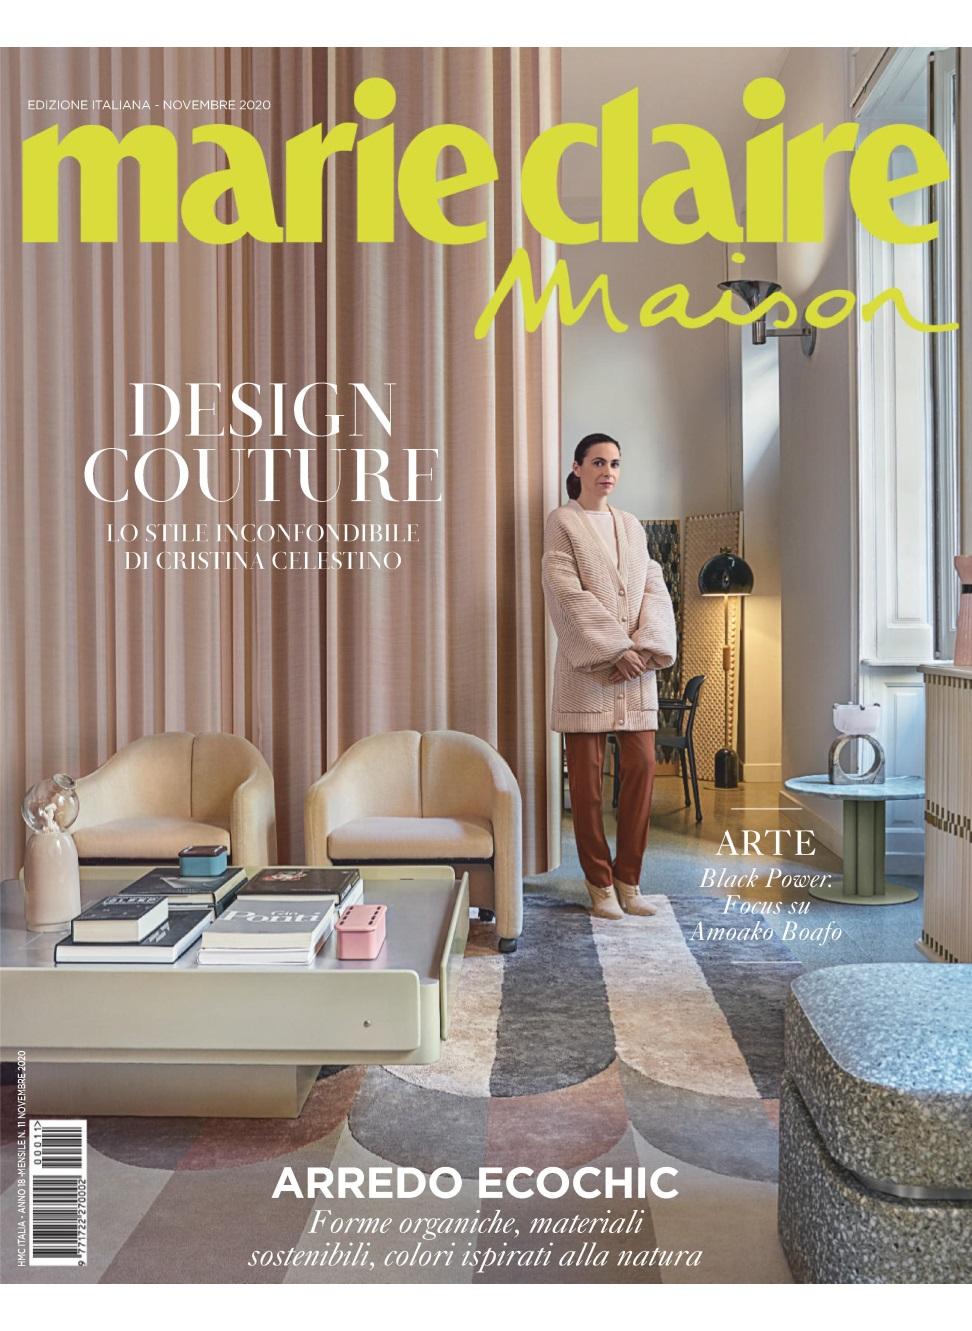 MANFREDI FINE HOTELS COLLECTION – MARIE CLAIRE MAISON – NOVEMBRE 2020